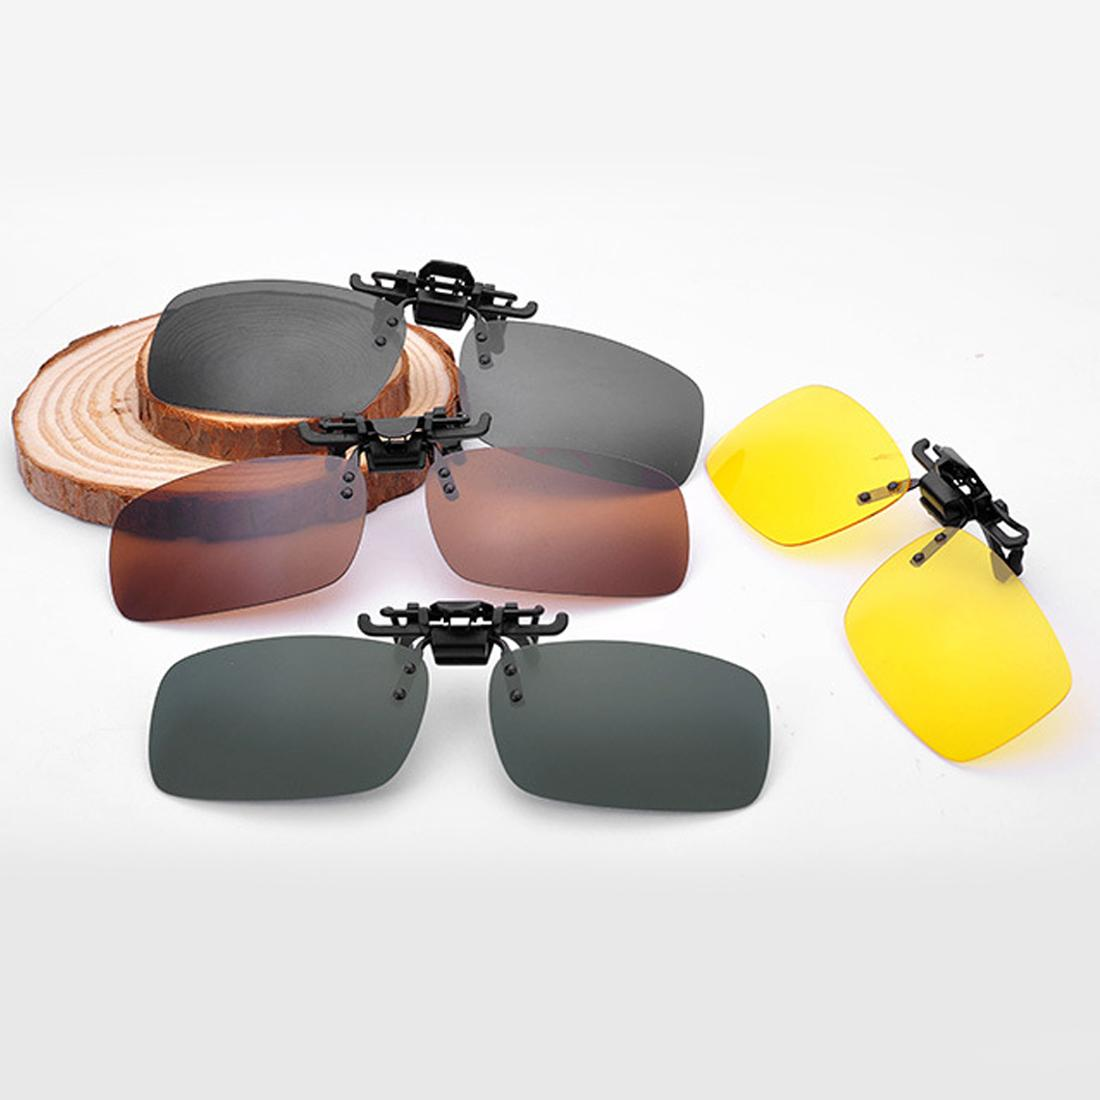 615097ad094 Top Sell Men Women Retro Flip Up Polarized Sunglasses Clip On Myopia Glasses  Day Night Vision Goggles Sun Glasses UV400 Victoria Beckham Sunglasses ...